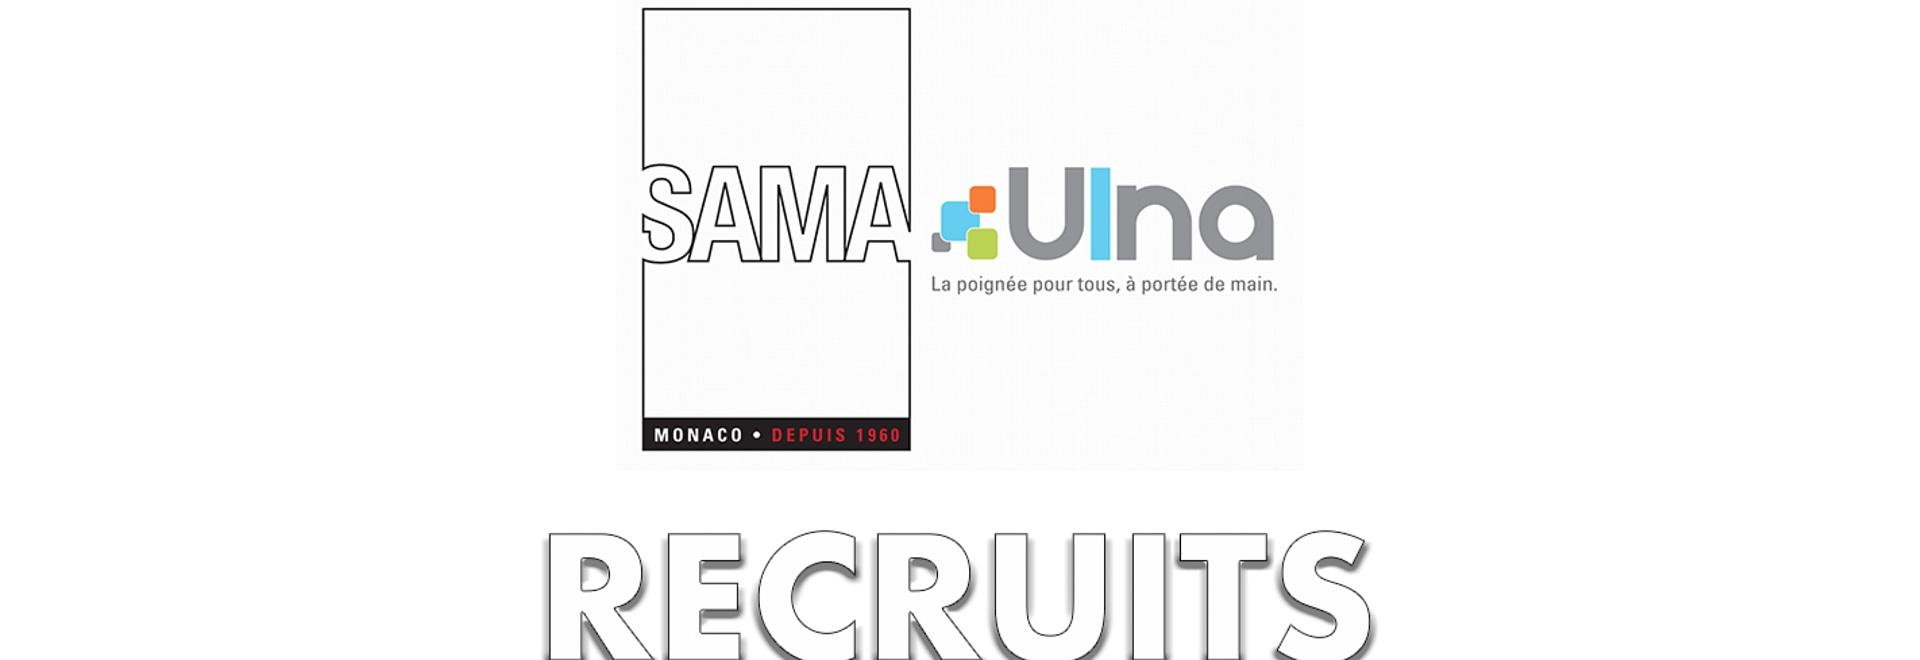 SAMA-ULNA Recrute